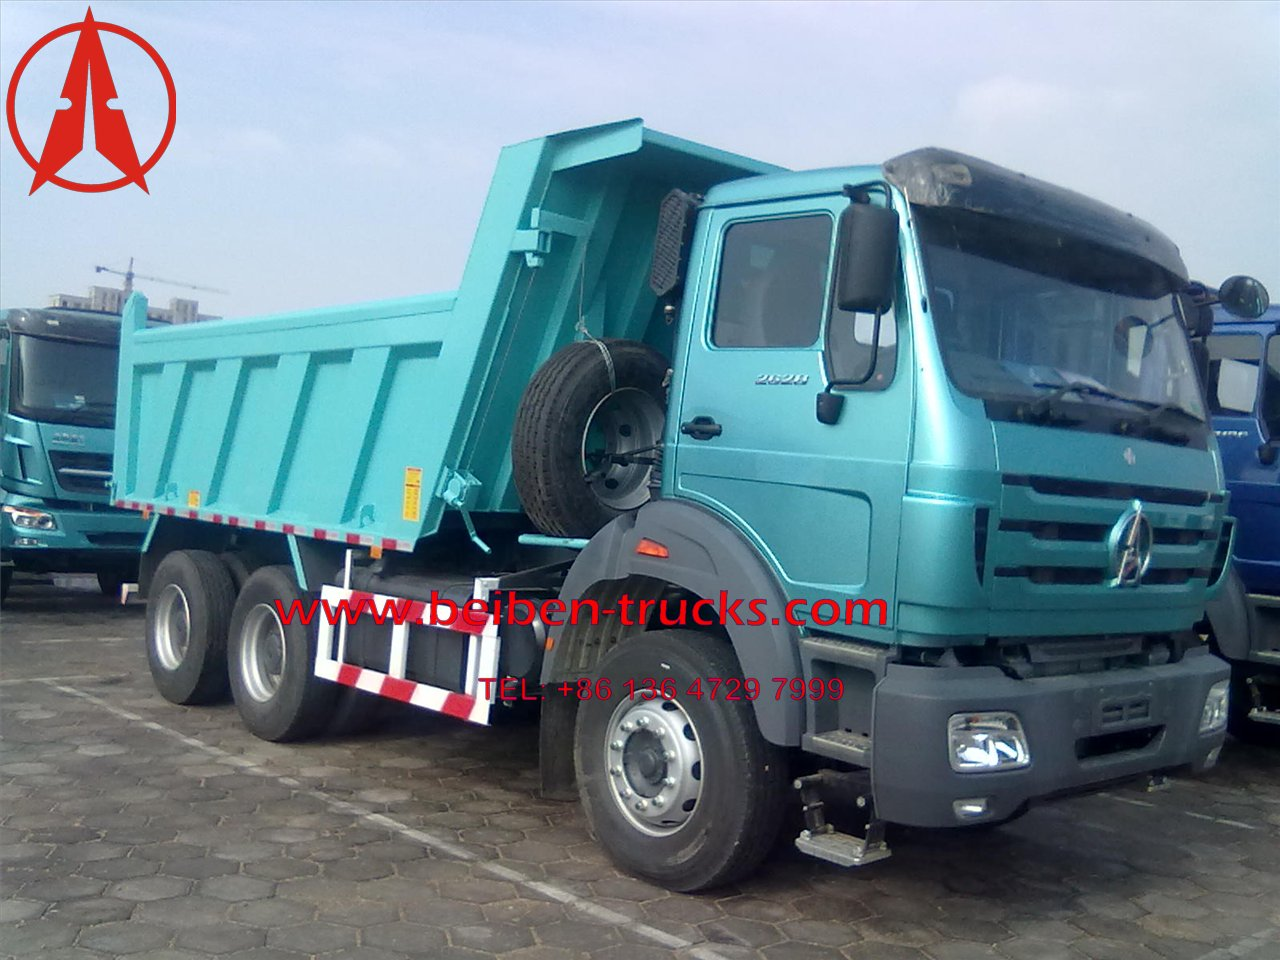 baotou Beiben 50 T dump trucks supplier